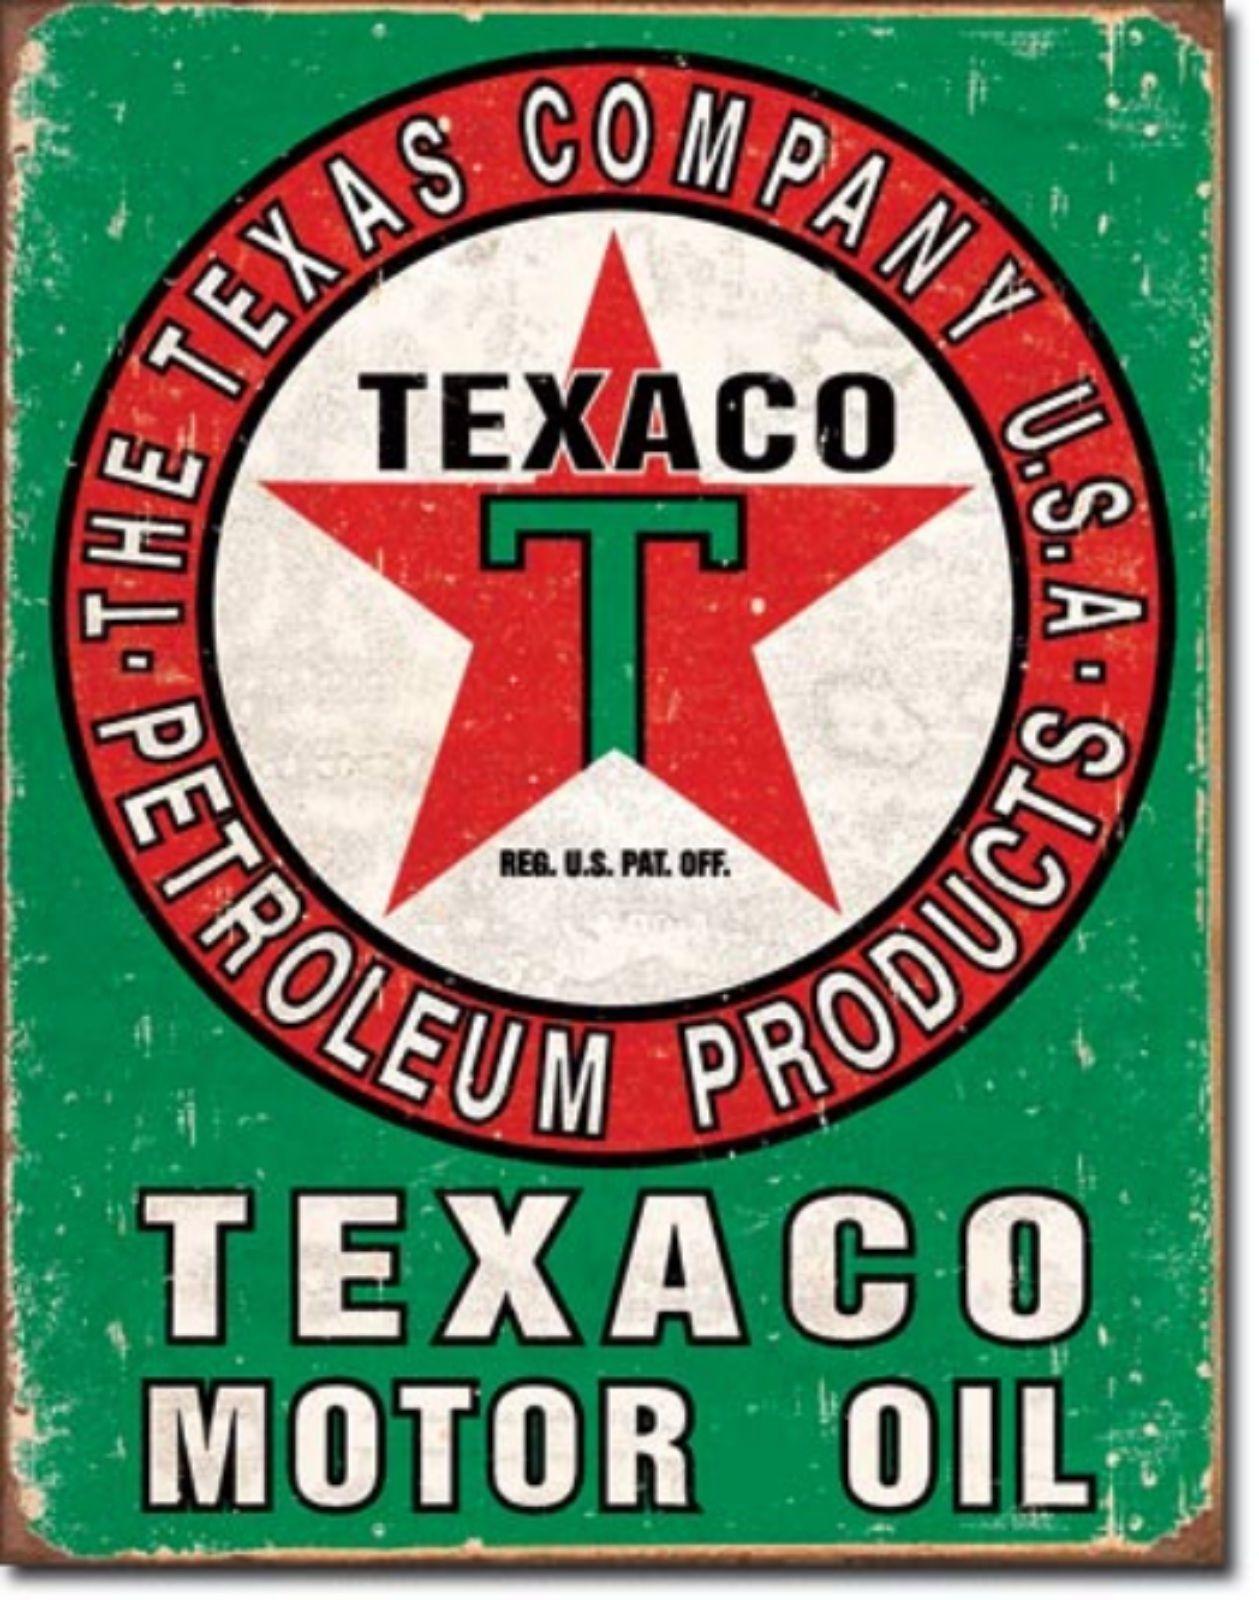 Texaco Motor Oil Texas Company Metal Sign Tin New Vintage Style #1927